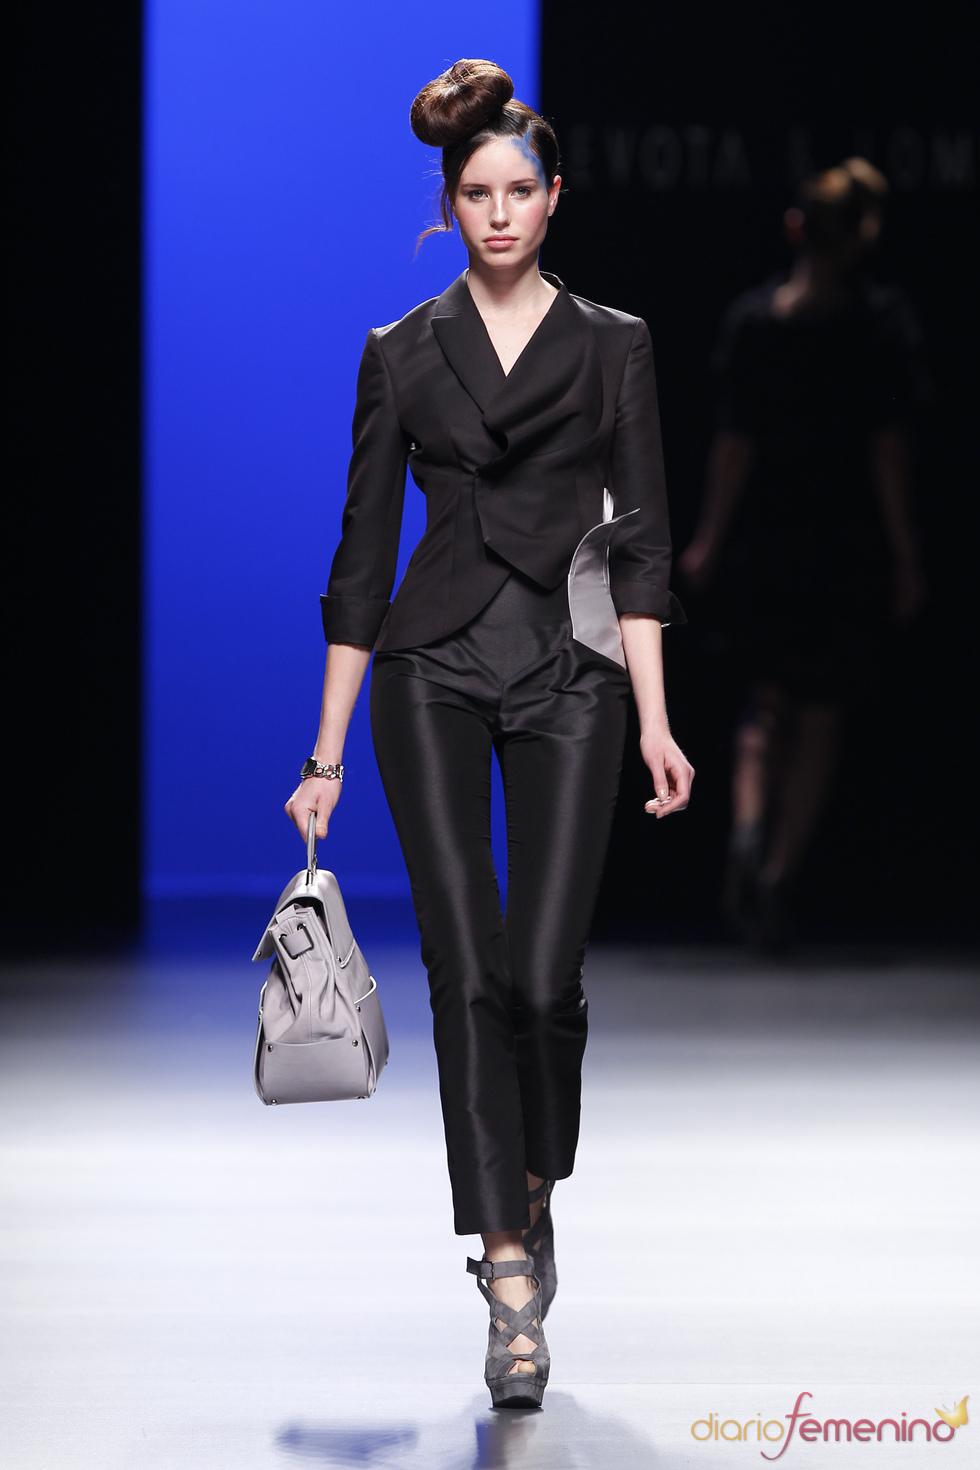 Fotos Moda: Devota&Lomba en Cibeles Madrid Fashion Week